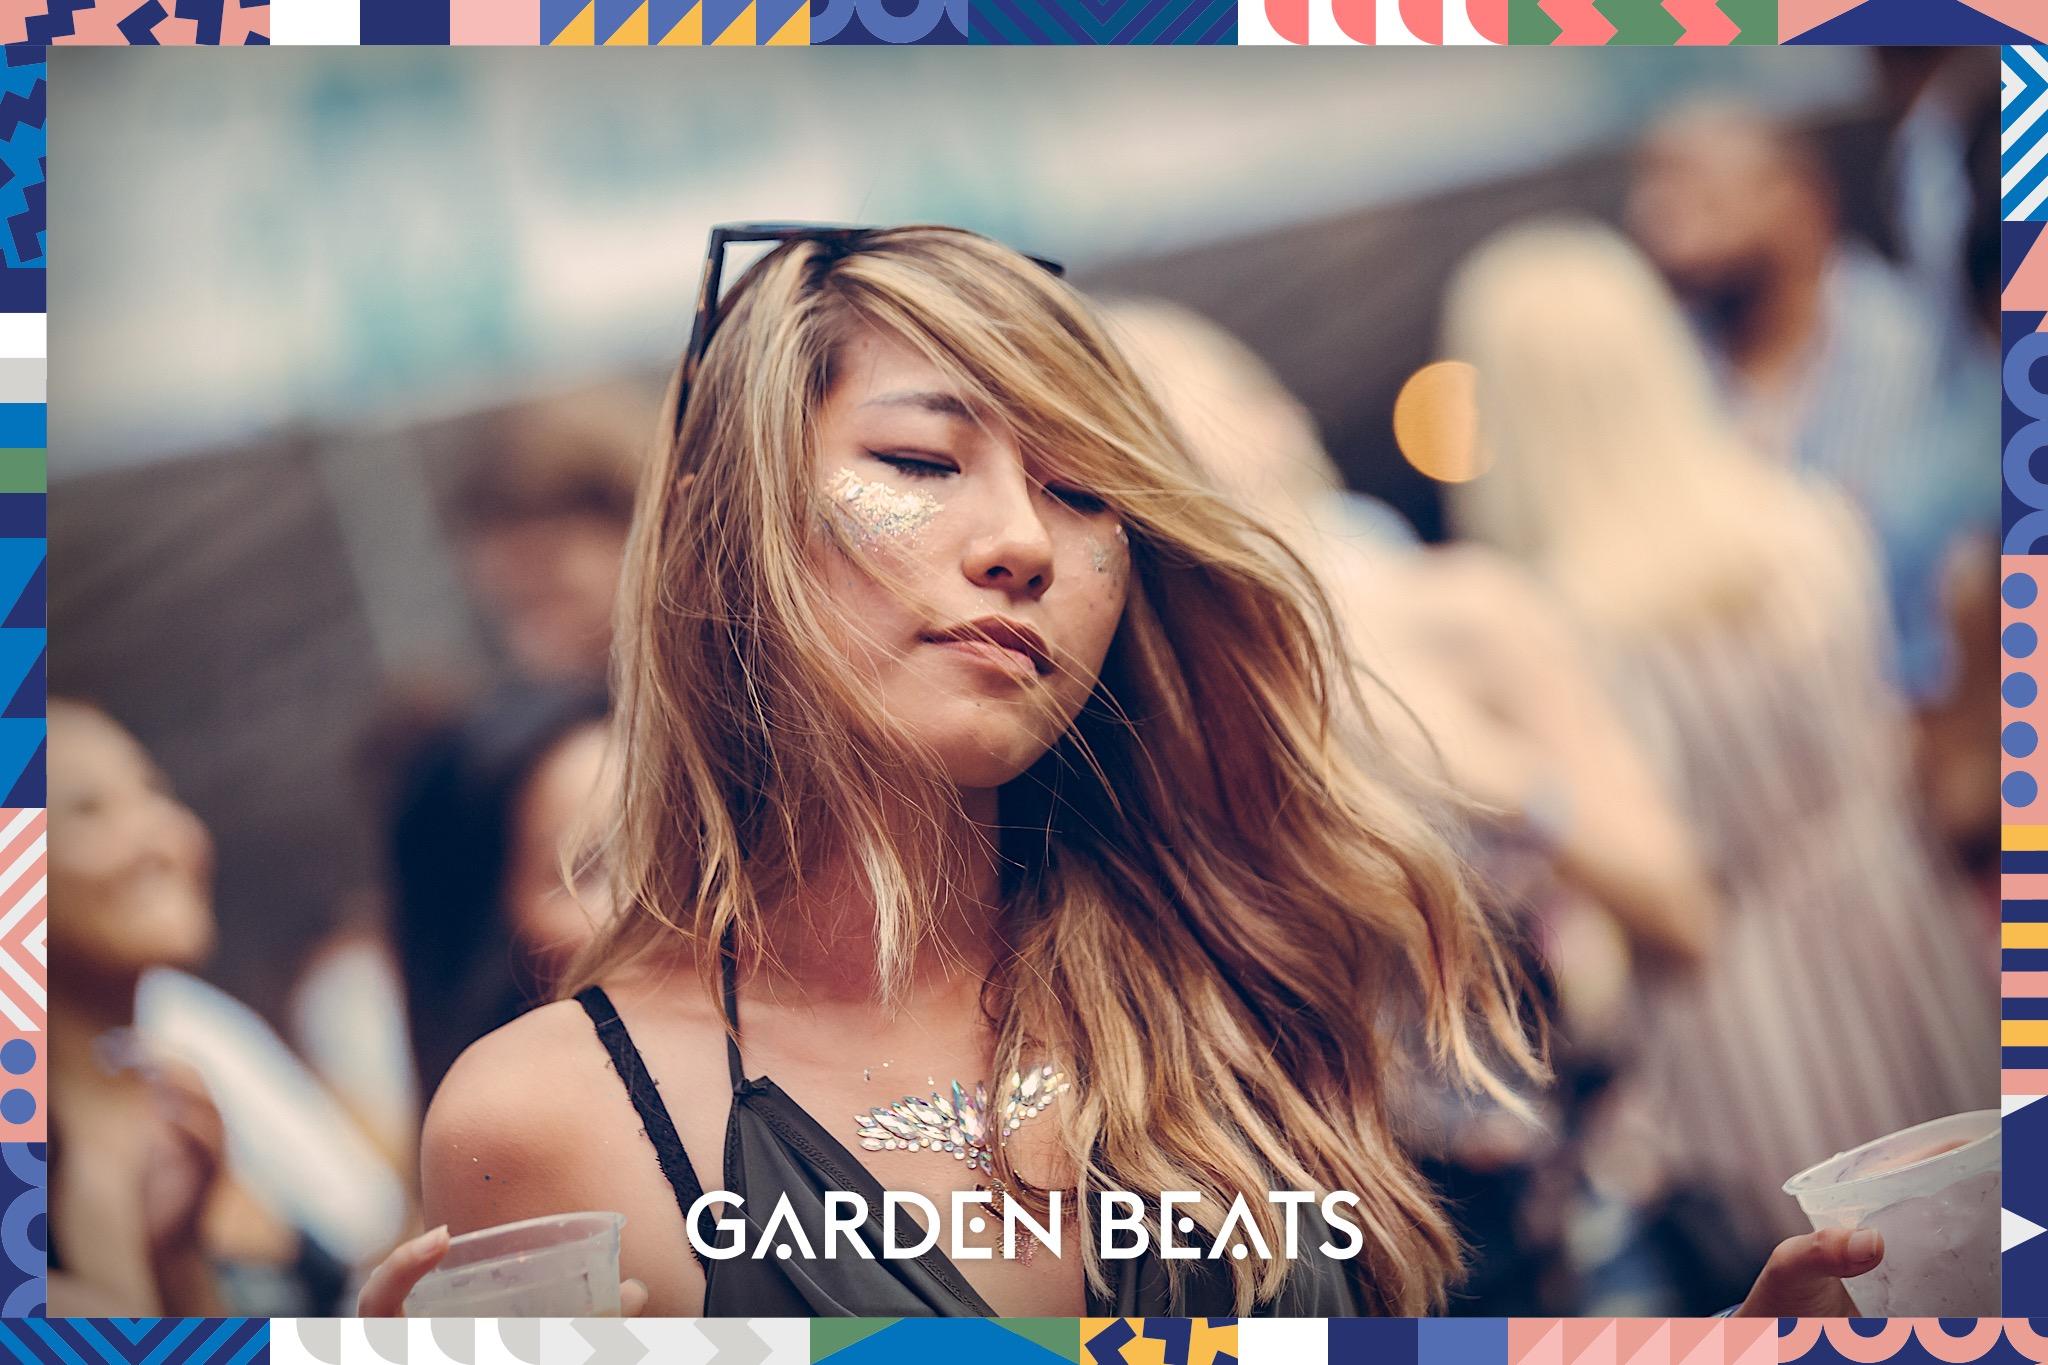 03032018_GardenBeats_Colossal602_Watermarked.jpg